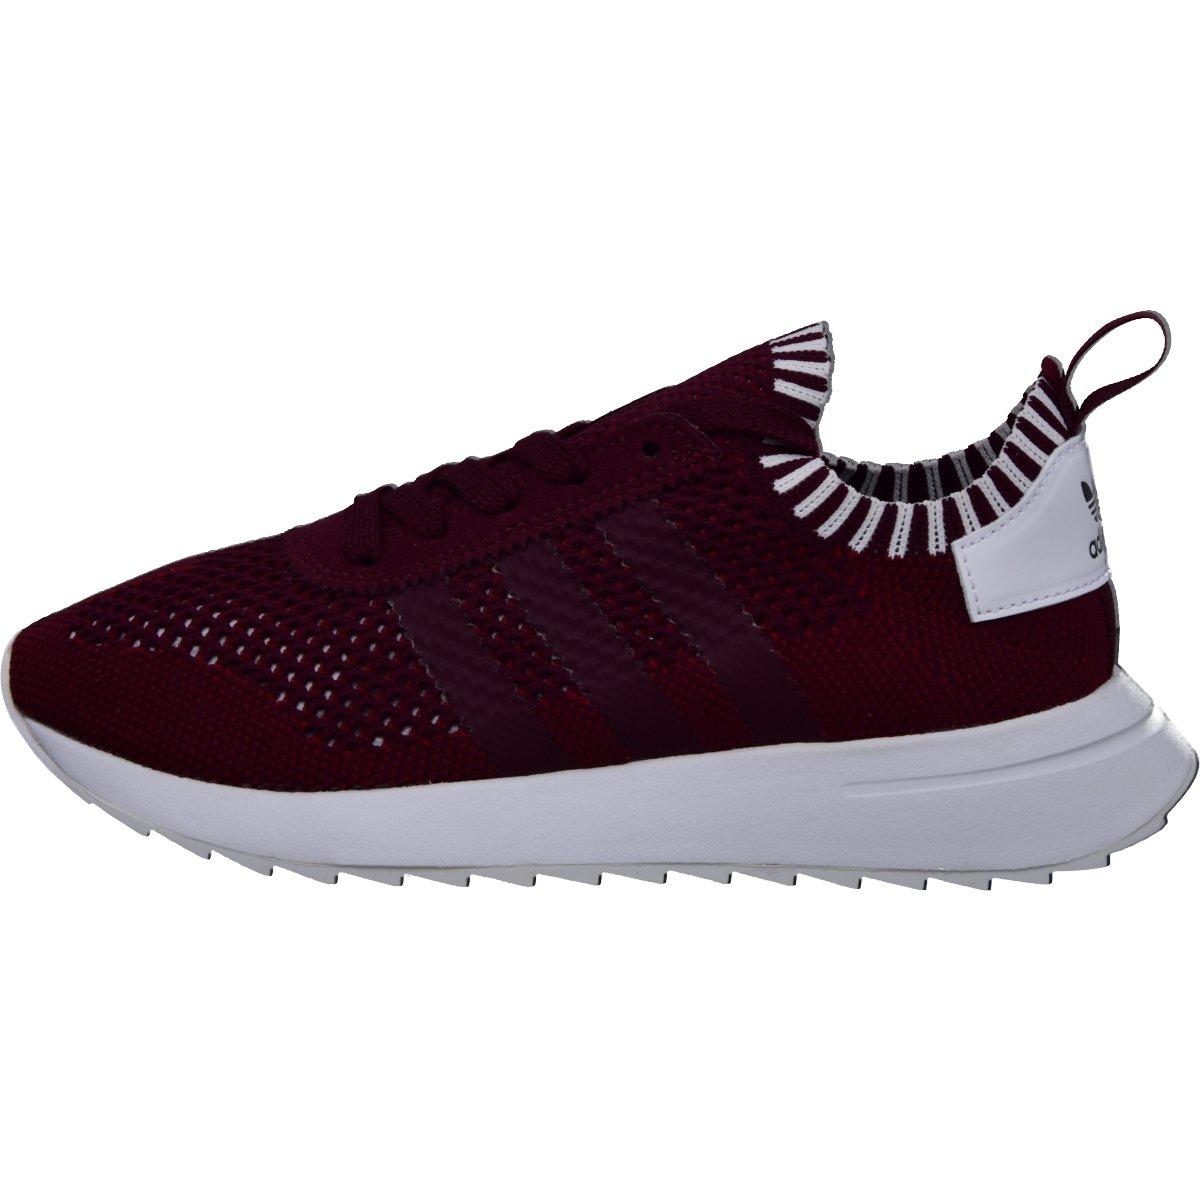 Adidas Originals Damen Turnschuhe Flashback B06XGGBYHP Turnschuhe Heißer verkauf